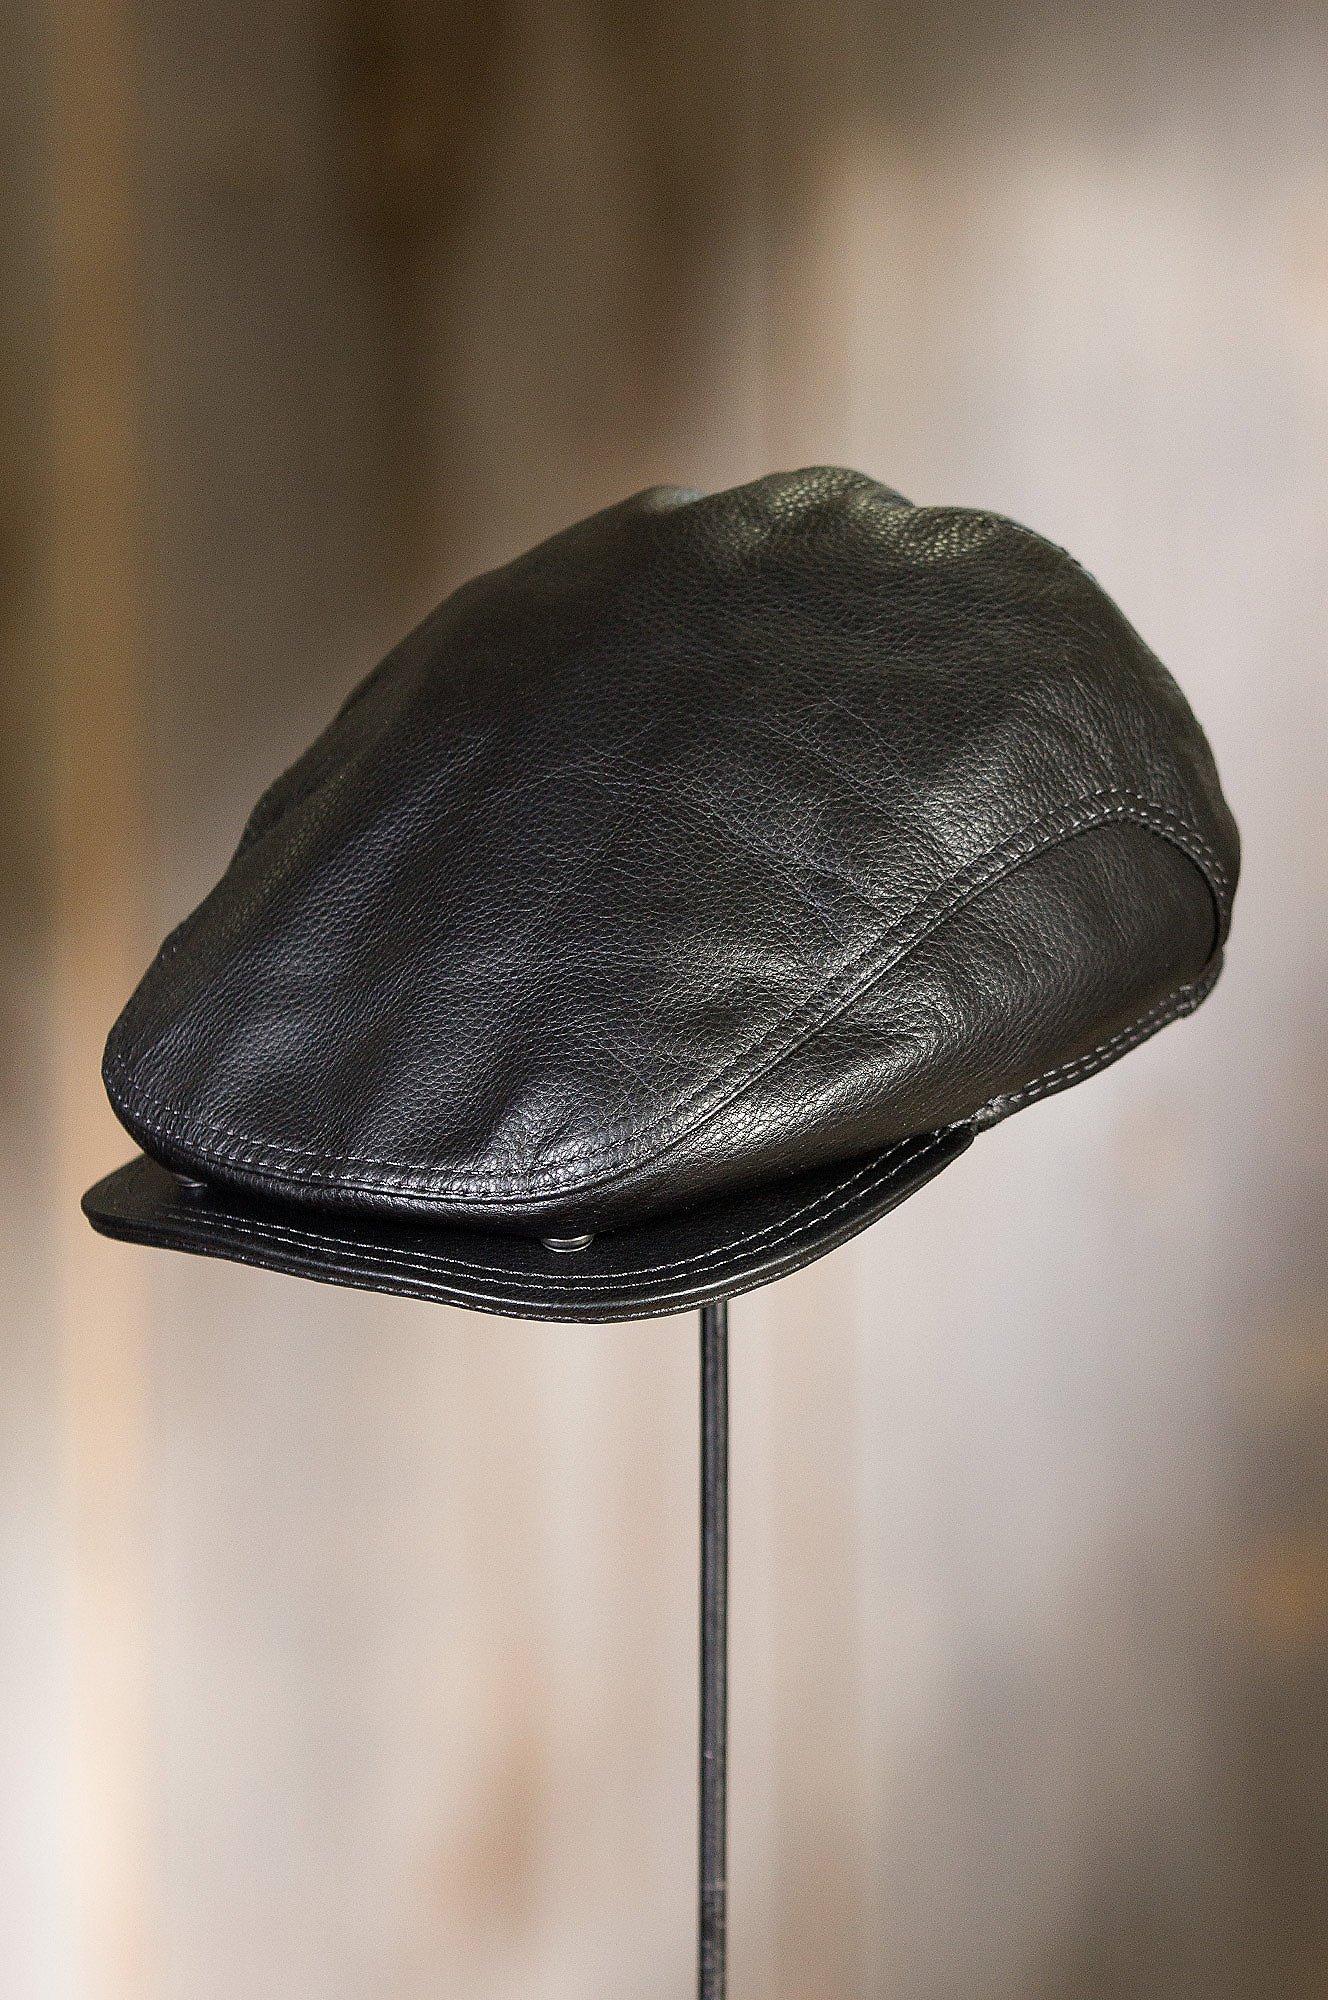 Overland Sheepskin Co. Allen Leather IVY Cap, Black, Size Large (7 1/4-7 3/8) by Overland Sheepskin Co (Image #8)